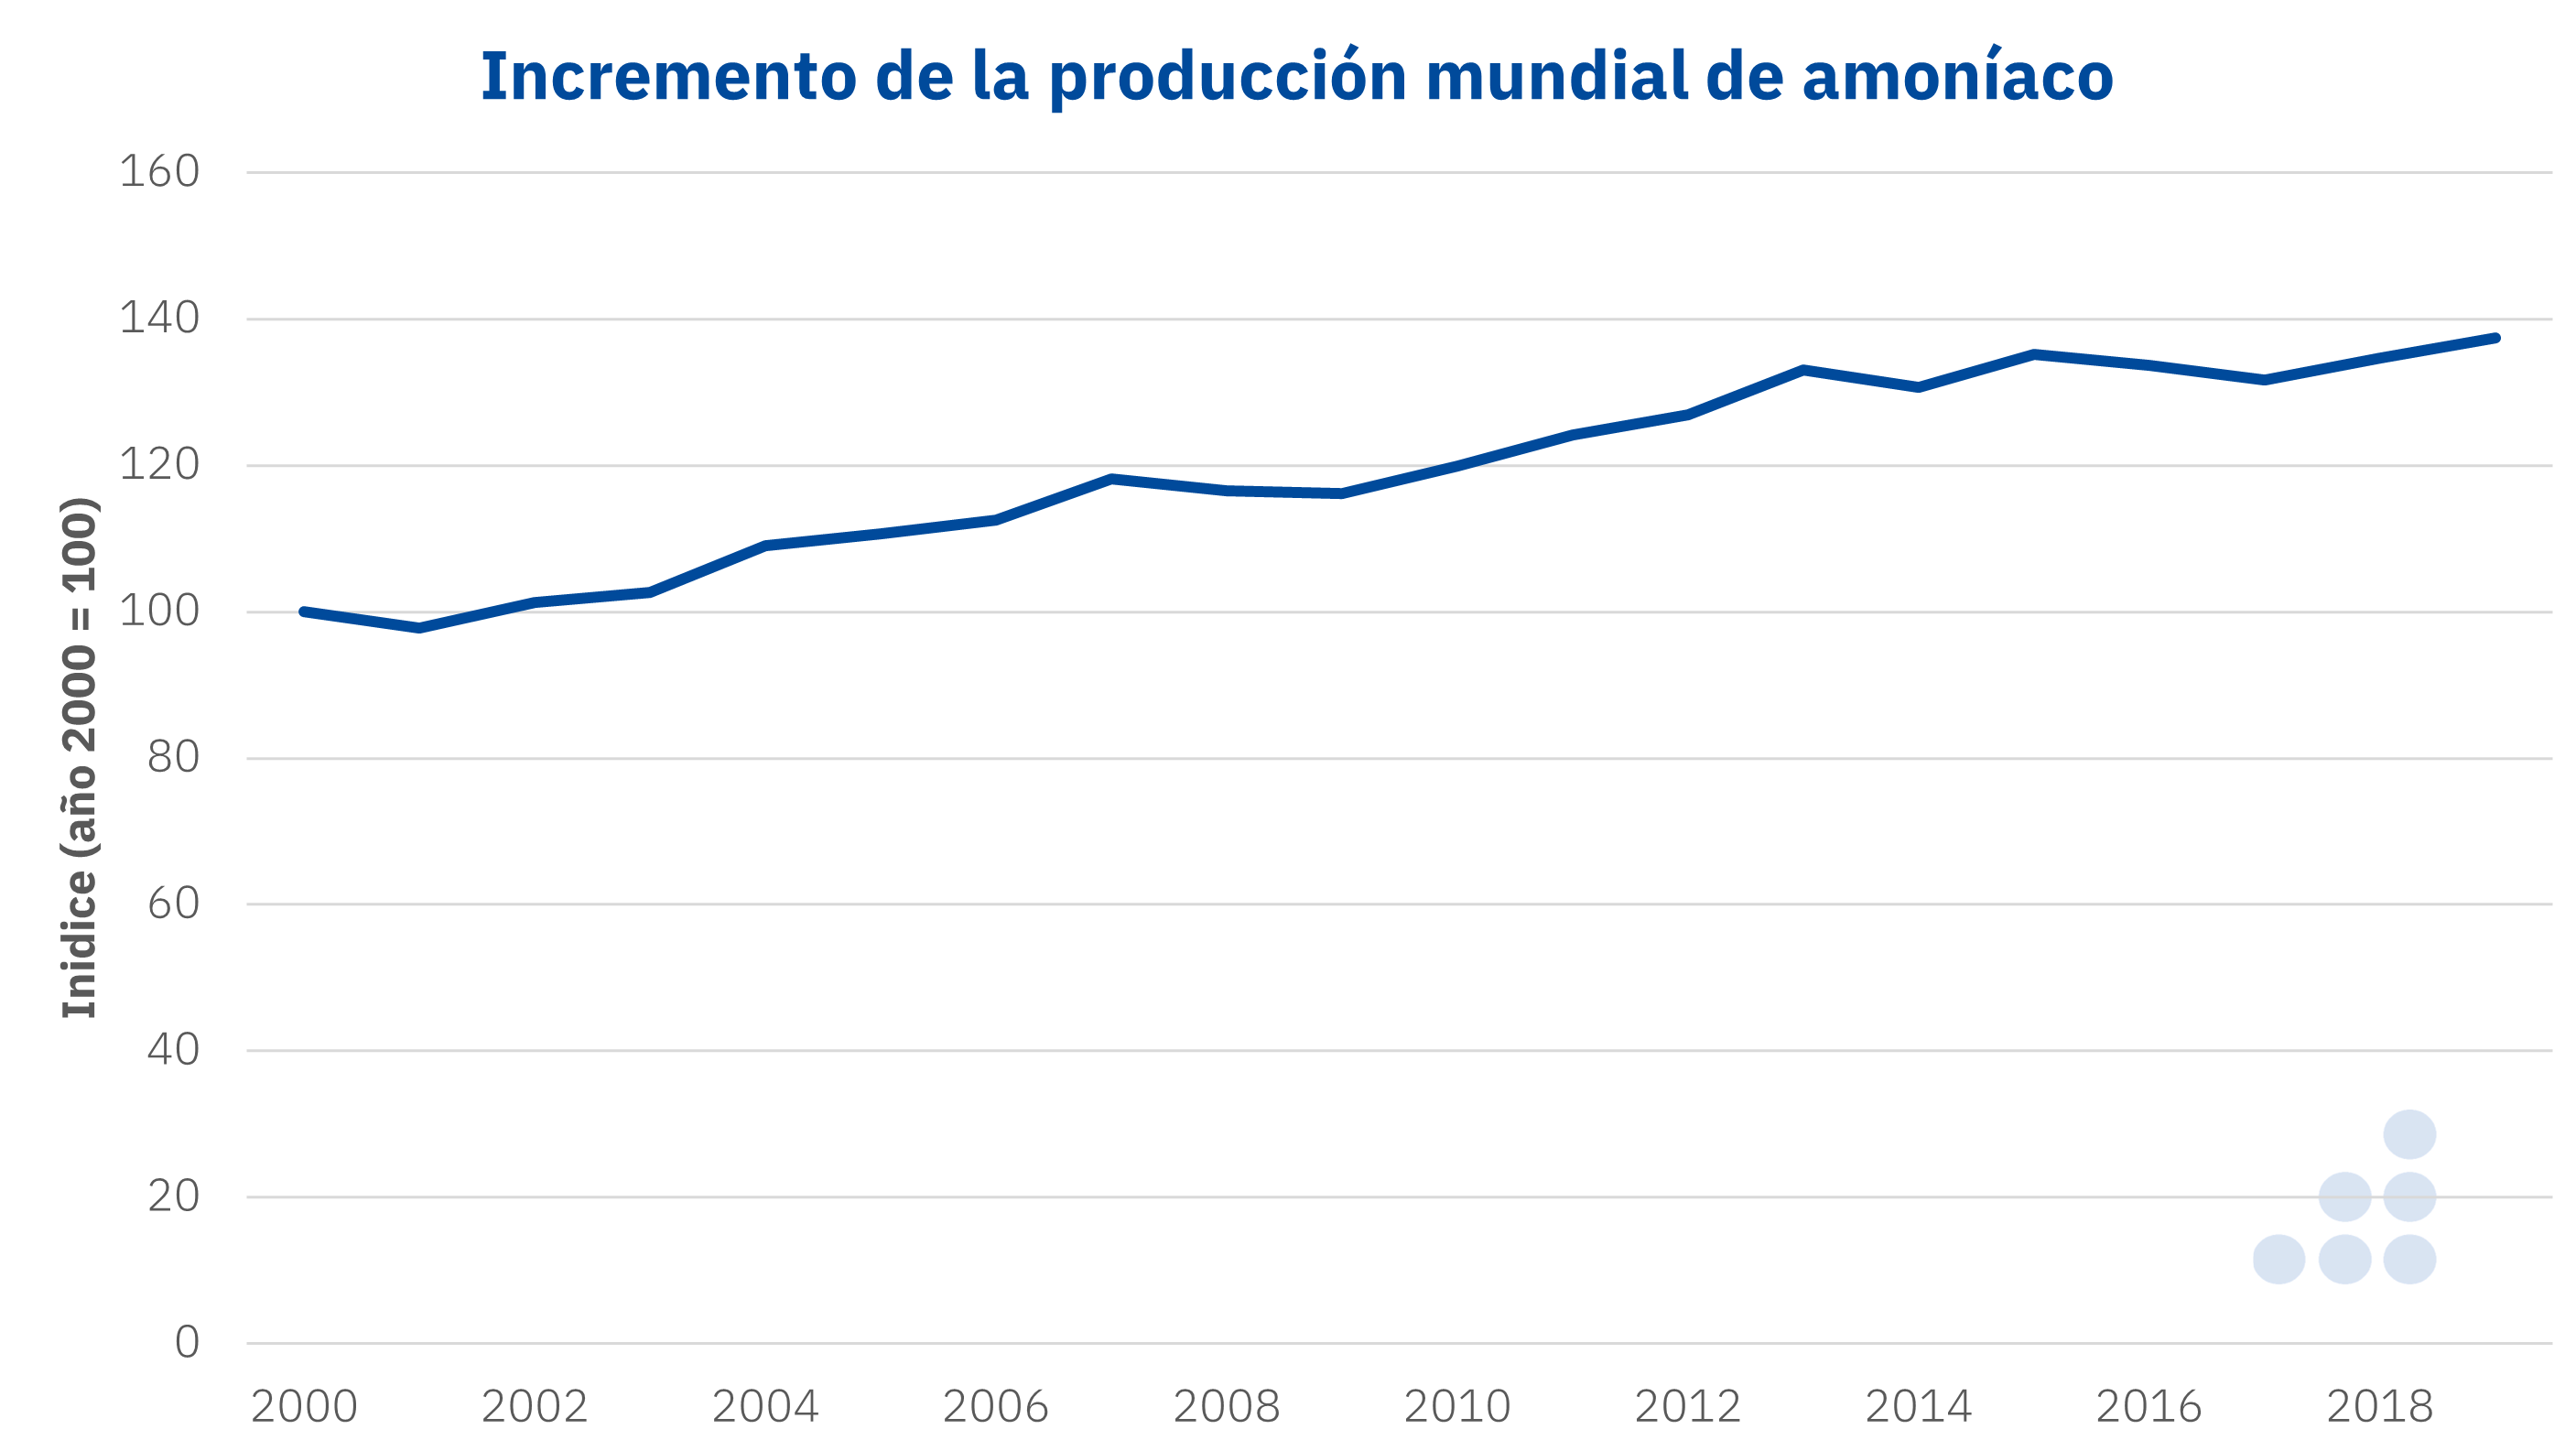 AleaSoft - Produccion mundial amoniaco